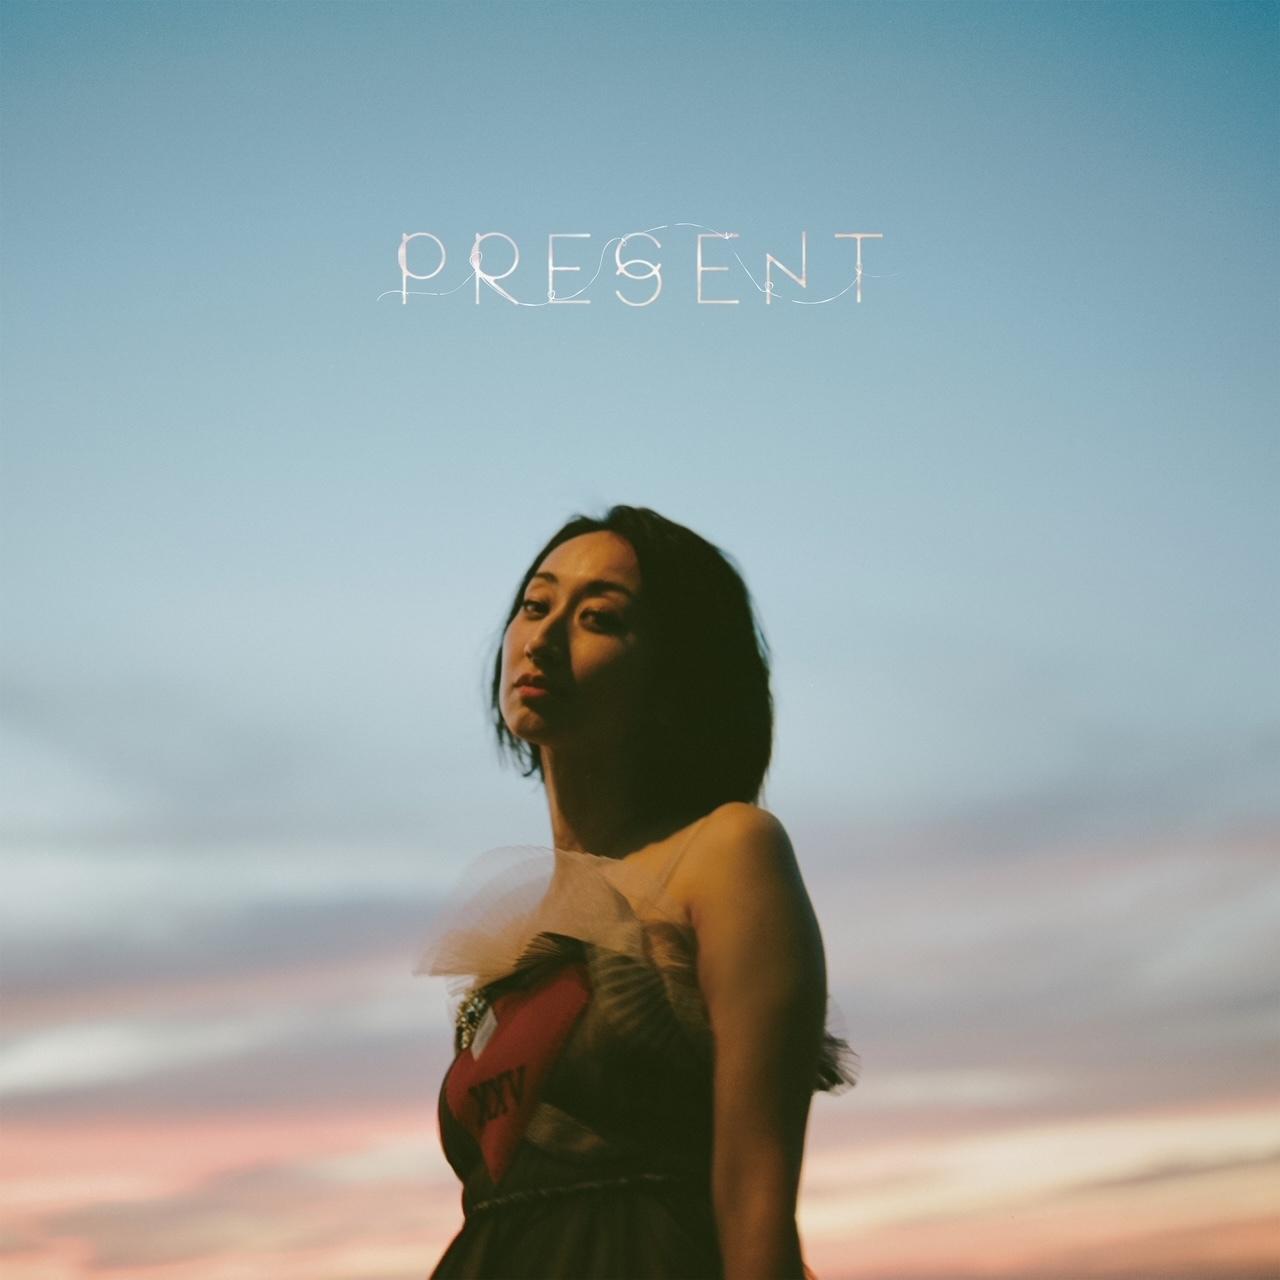 『PRESENT』初回限定盤ジャケット